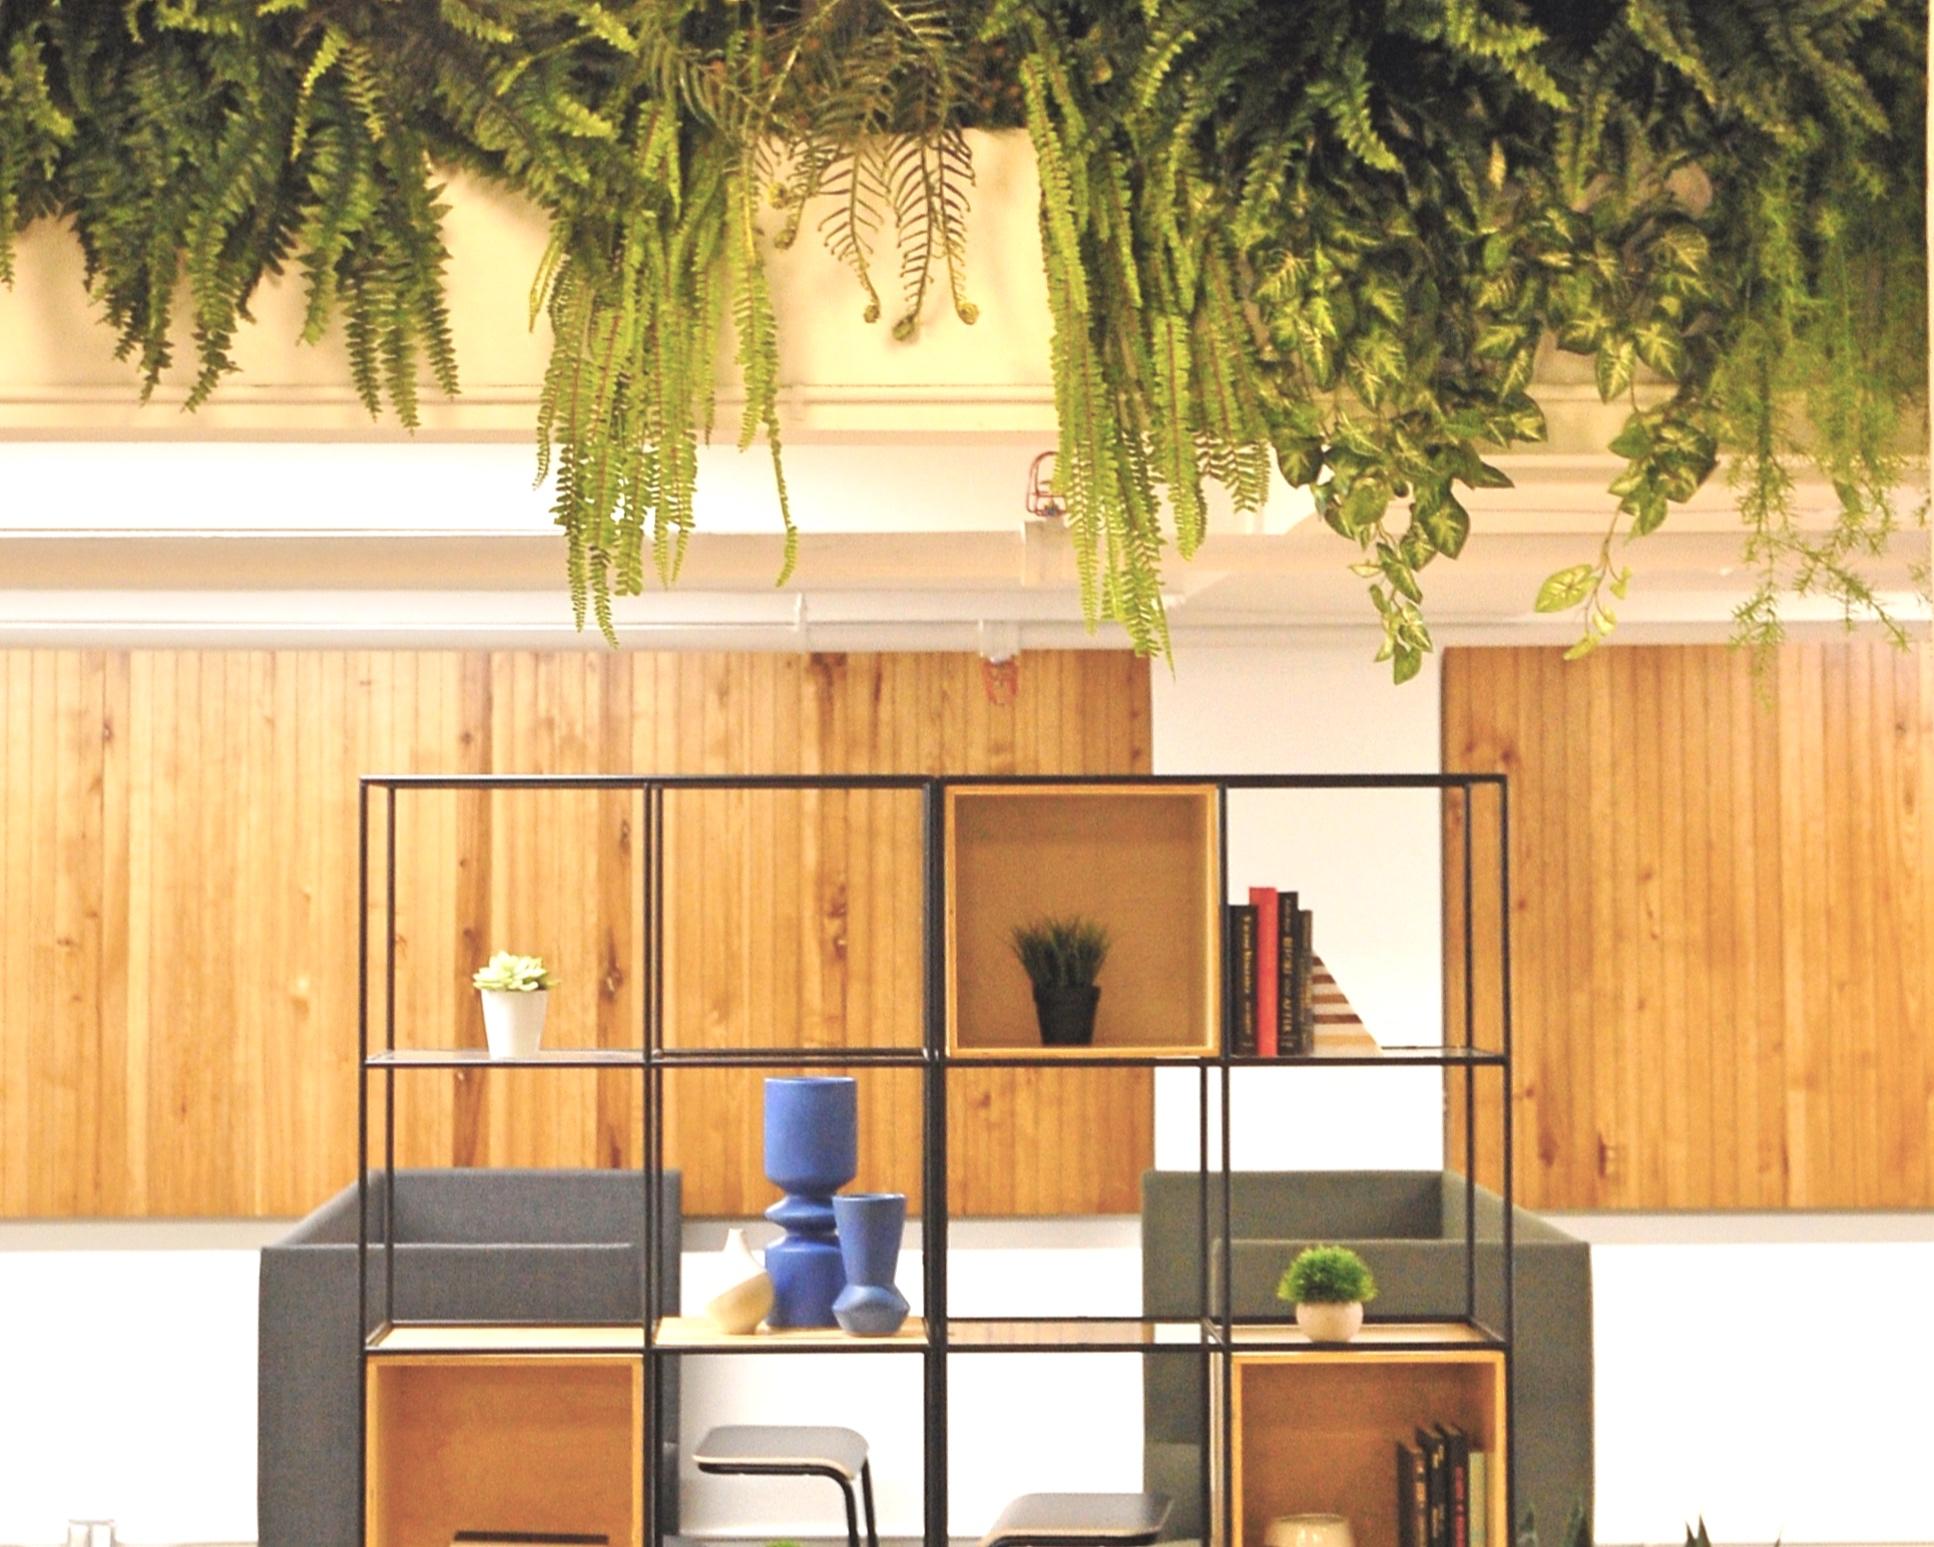 knotel chelsea showroom